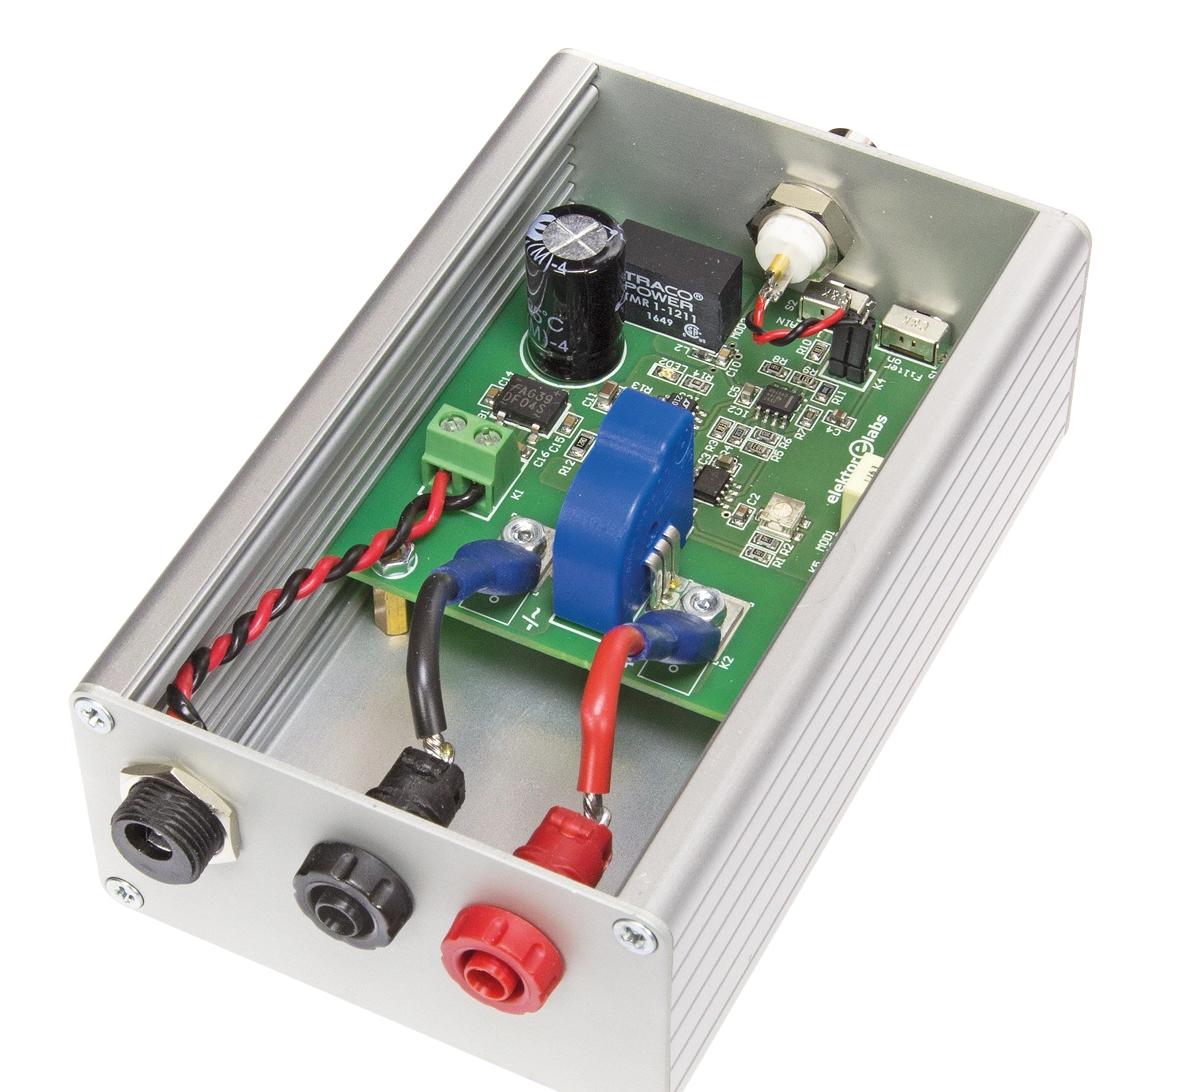 Free Elektor Article: Current Transformer for Oscilloscopes